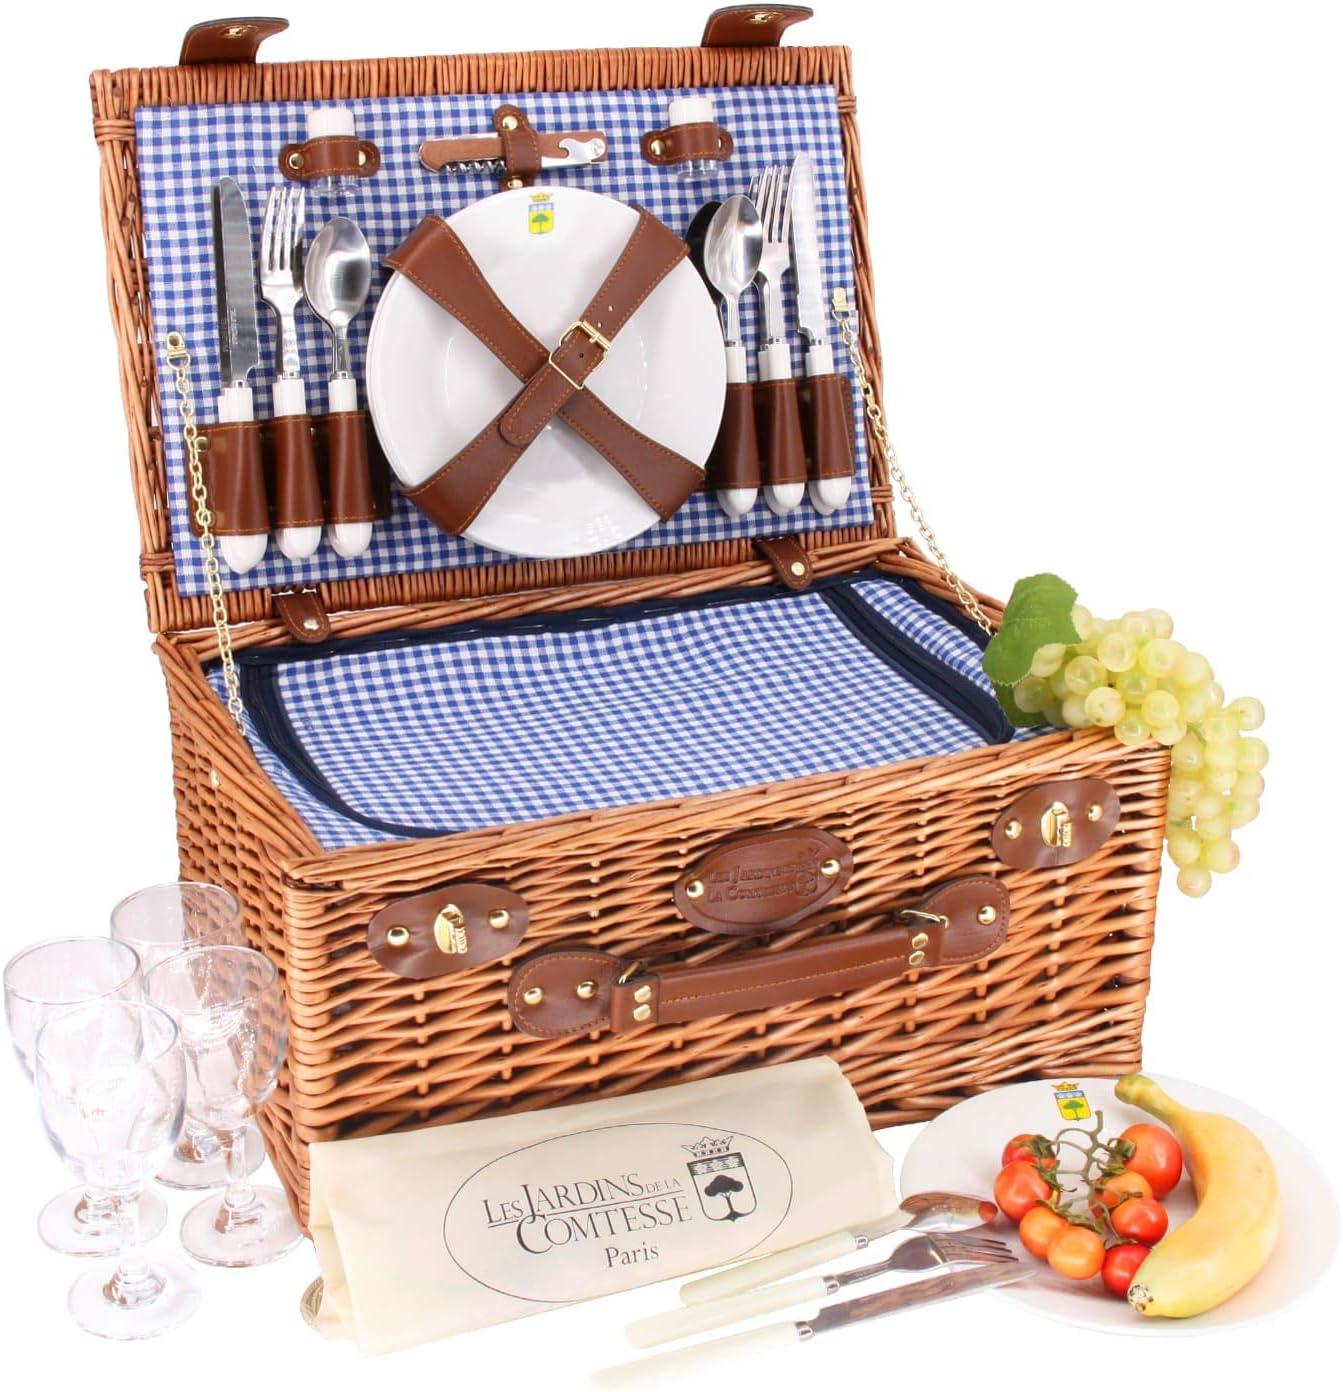 Compartimento nevera isot/érmico Platos de cer/ámica y copas de vino de cristal Cesta de picnic Marly tejido vichy azul Les Jardins de la Comtesse 46 x 31 x 20 cm Completo 4 personas